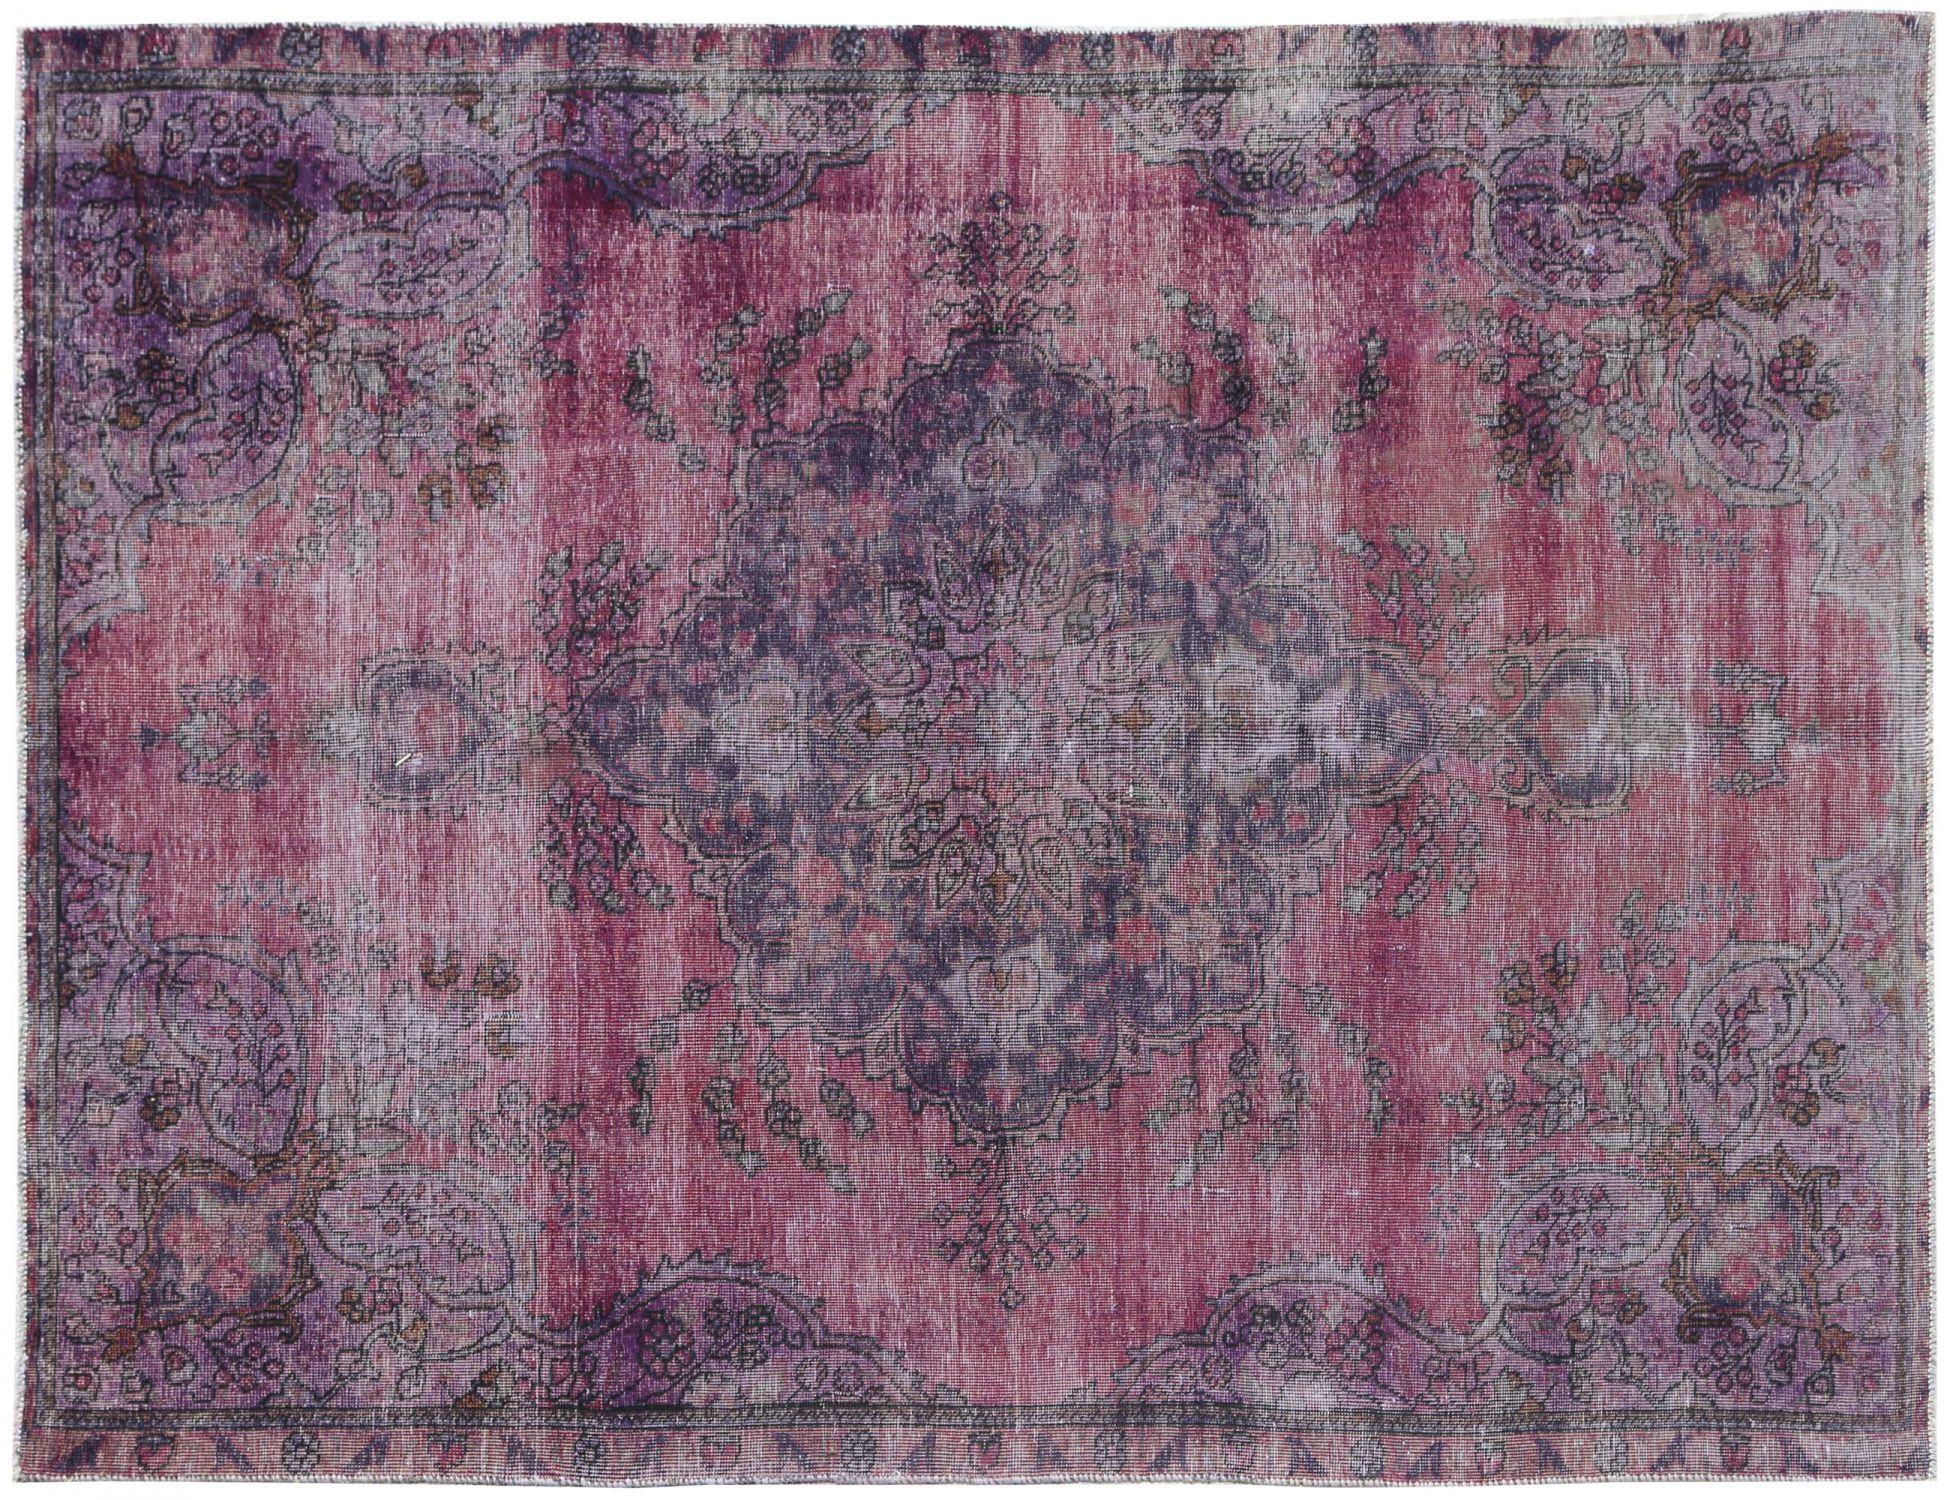 Vintage Carpet  violetti <br/>284 x 184 cm